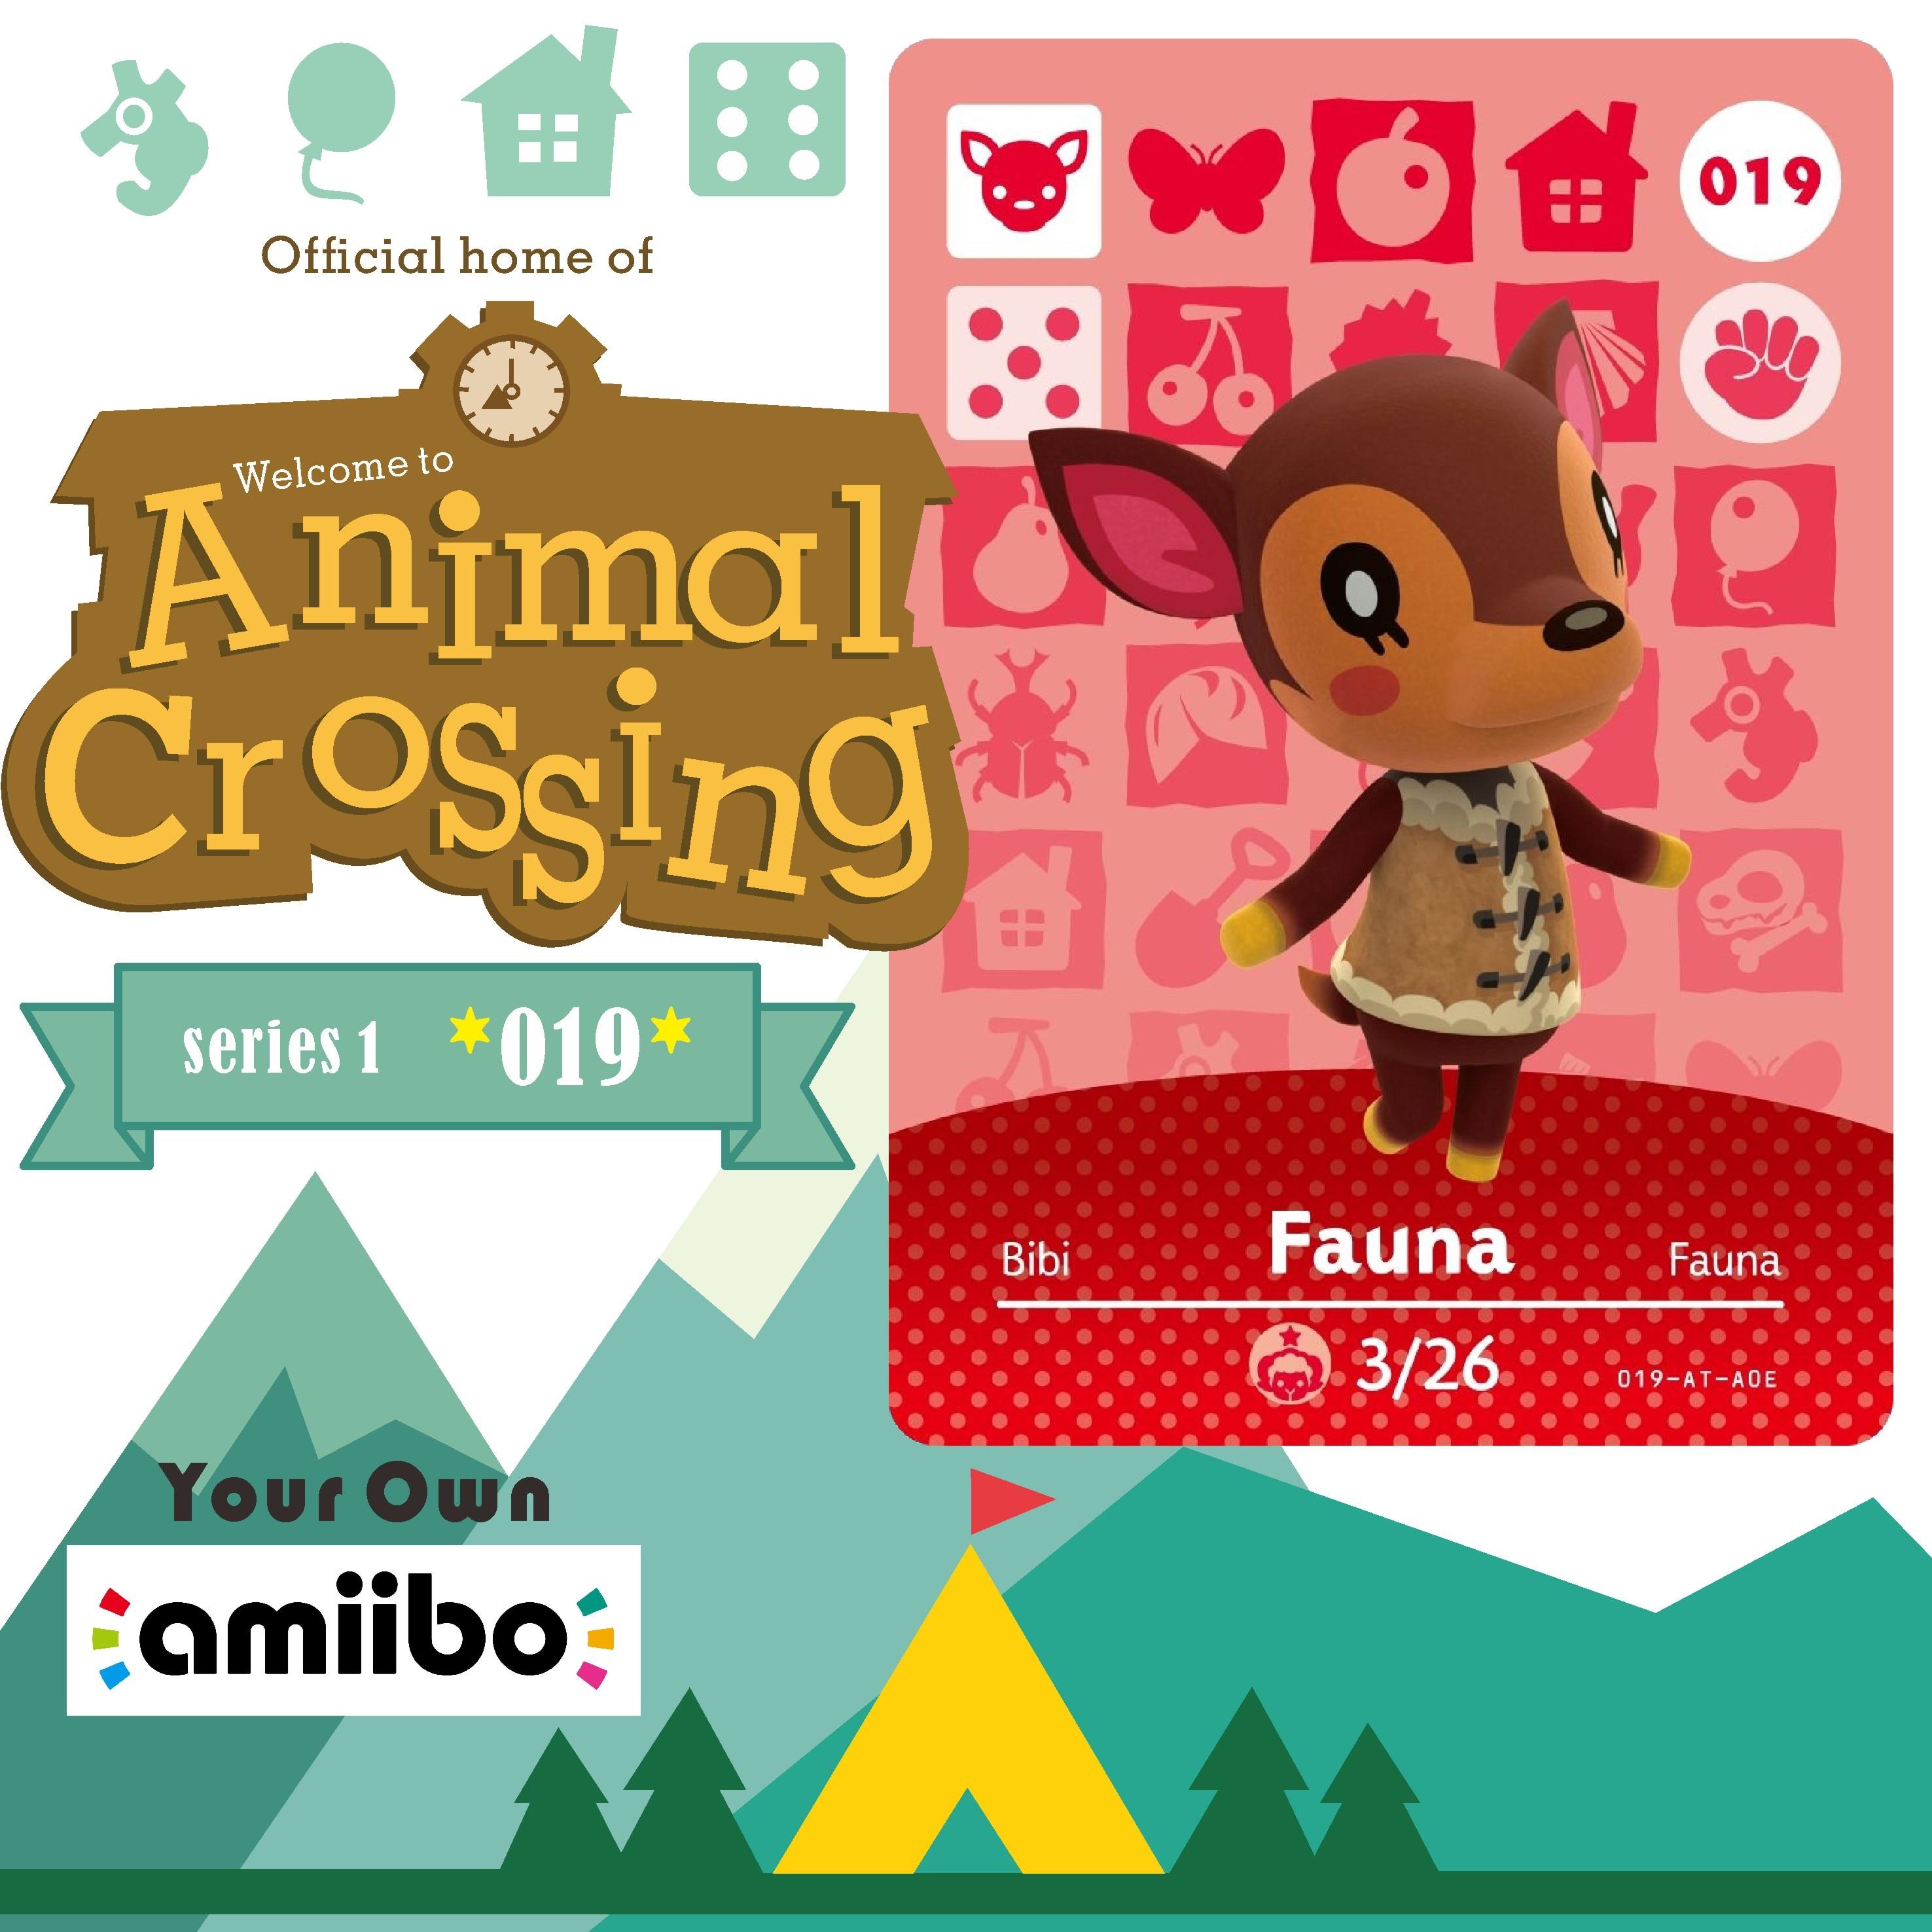 019 Fauna TARJETA DE Amiibo Animal Crossing serie Animal Crossing Nuevos Horizontes TARJETA DE Amiibo para Ns interruptor juegos tarjeta Nfc